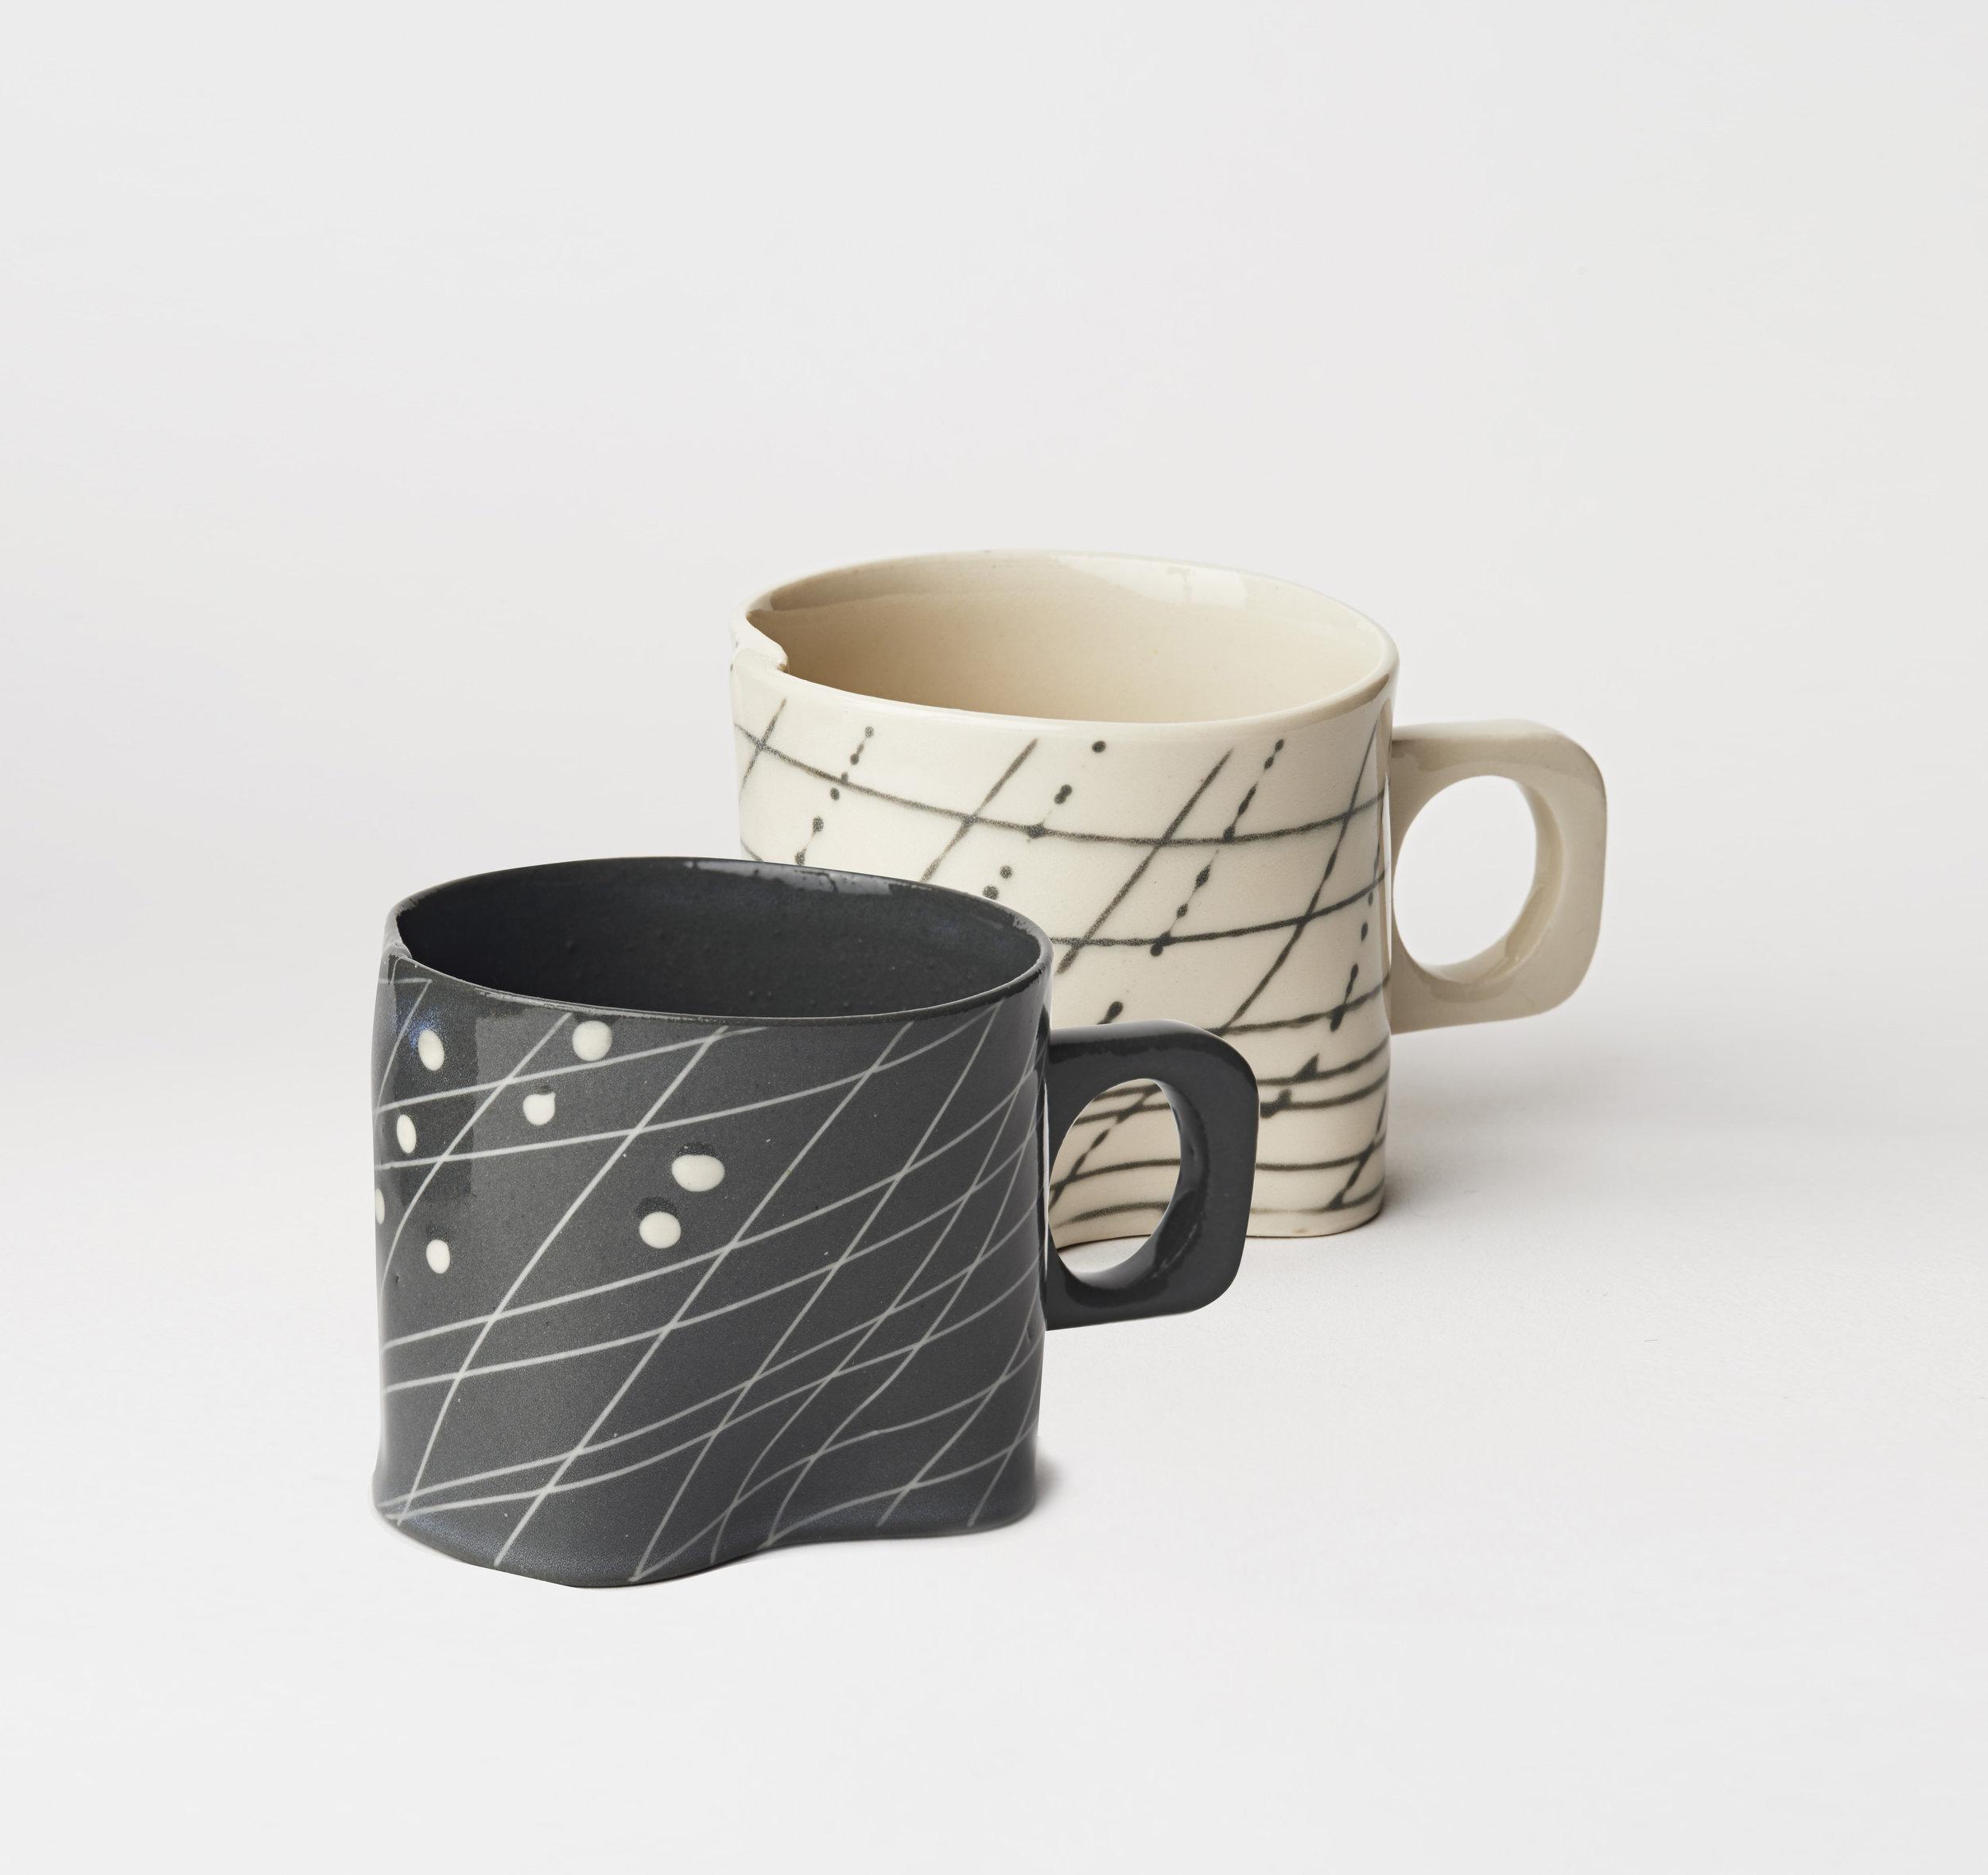 Black and white mug2.jpg